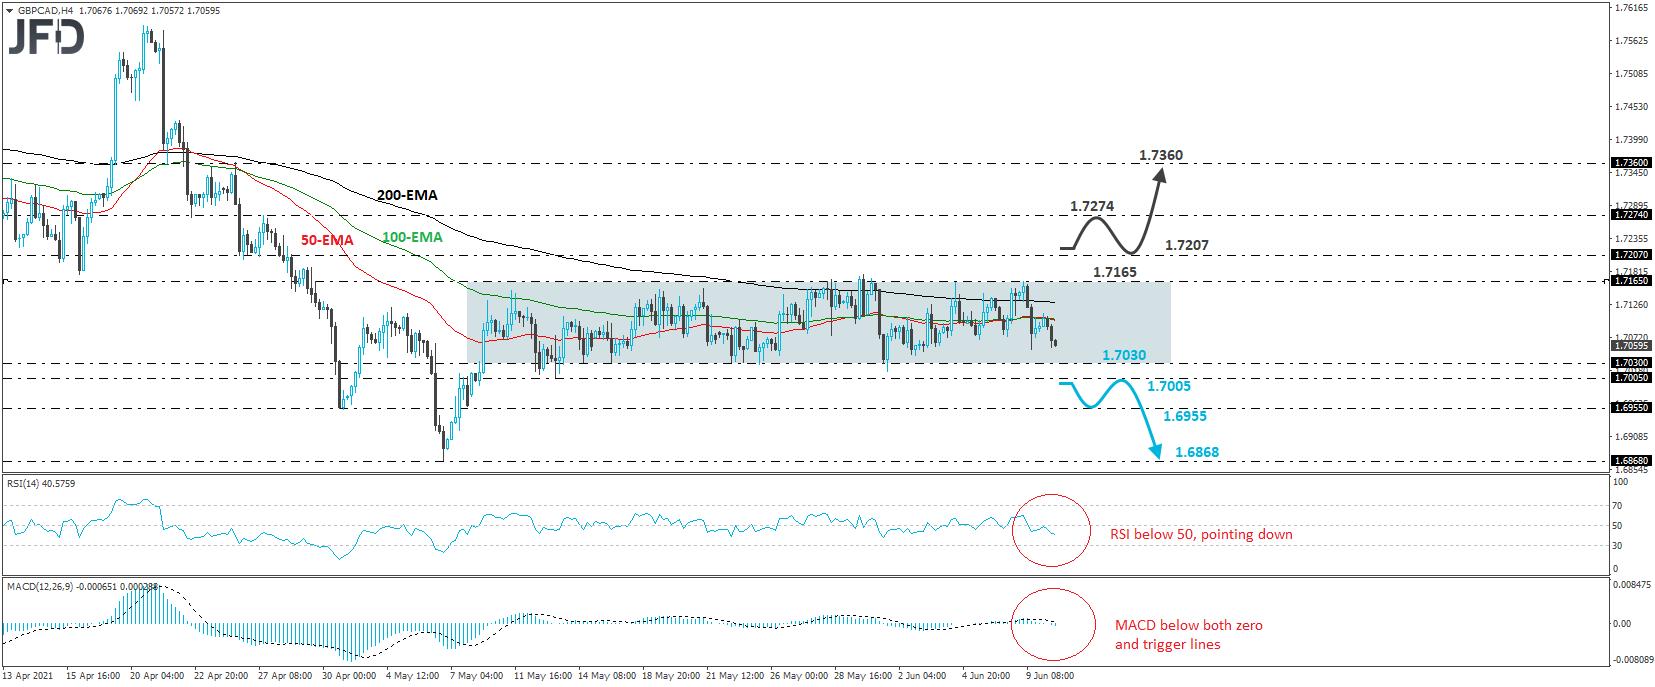 GBP/CAD 4-hour chart technical analysis